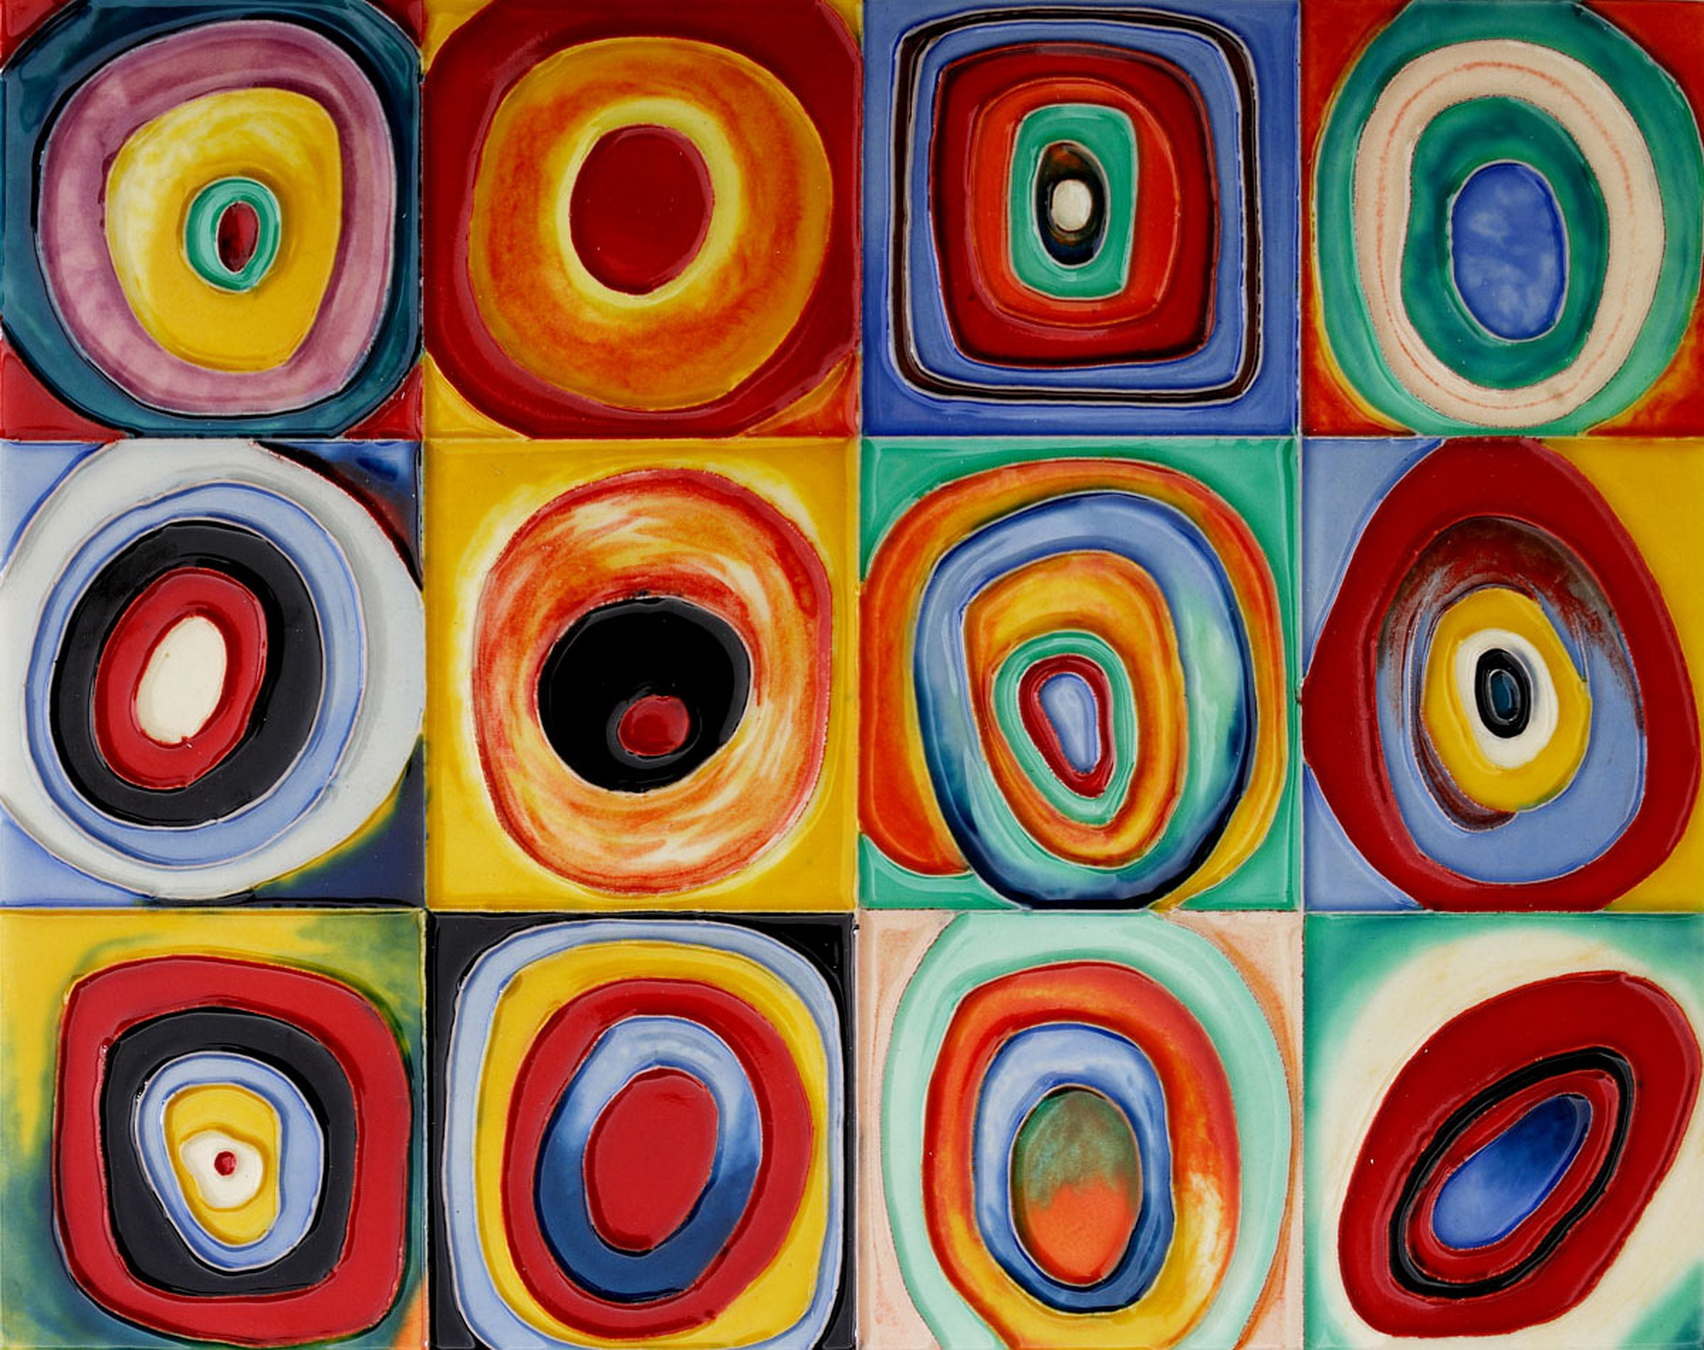 kandinsky el primer abstracto artesan nato. Black Bedroom Furniture Sets. Home Design Ideas